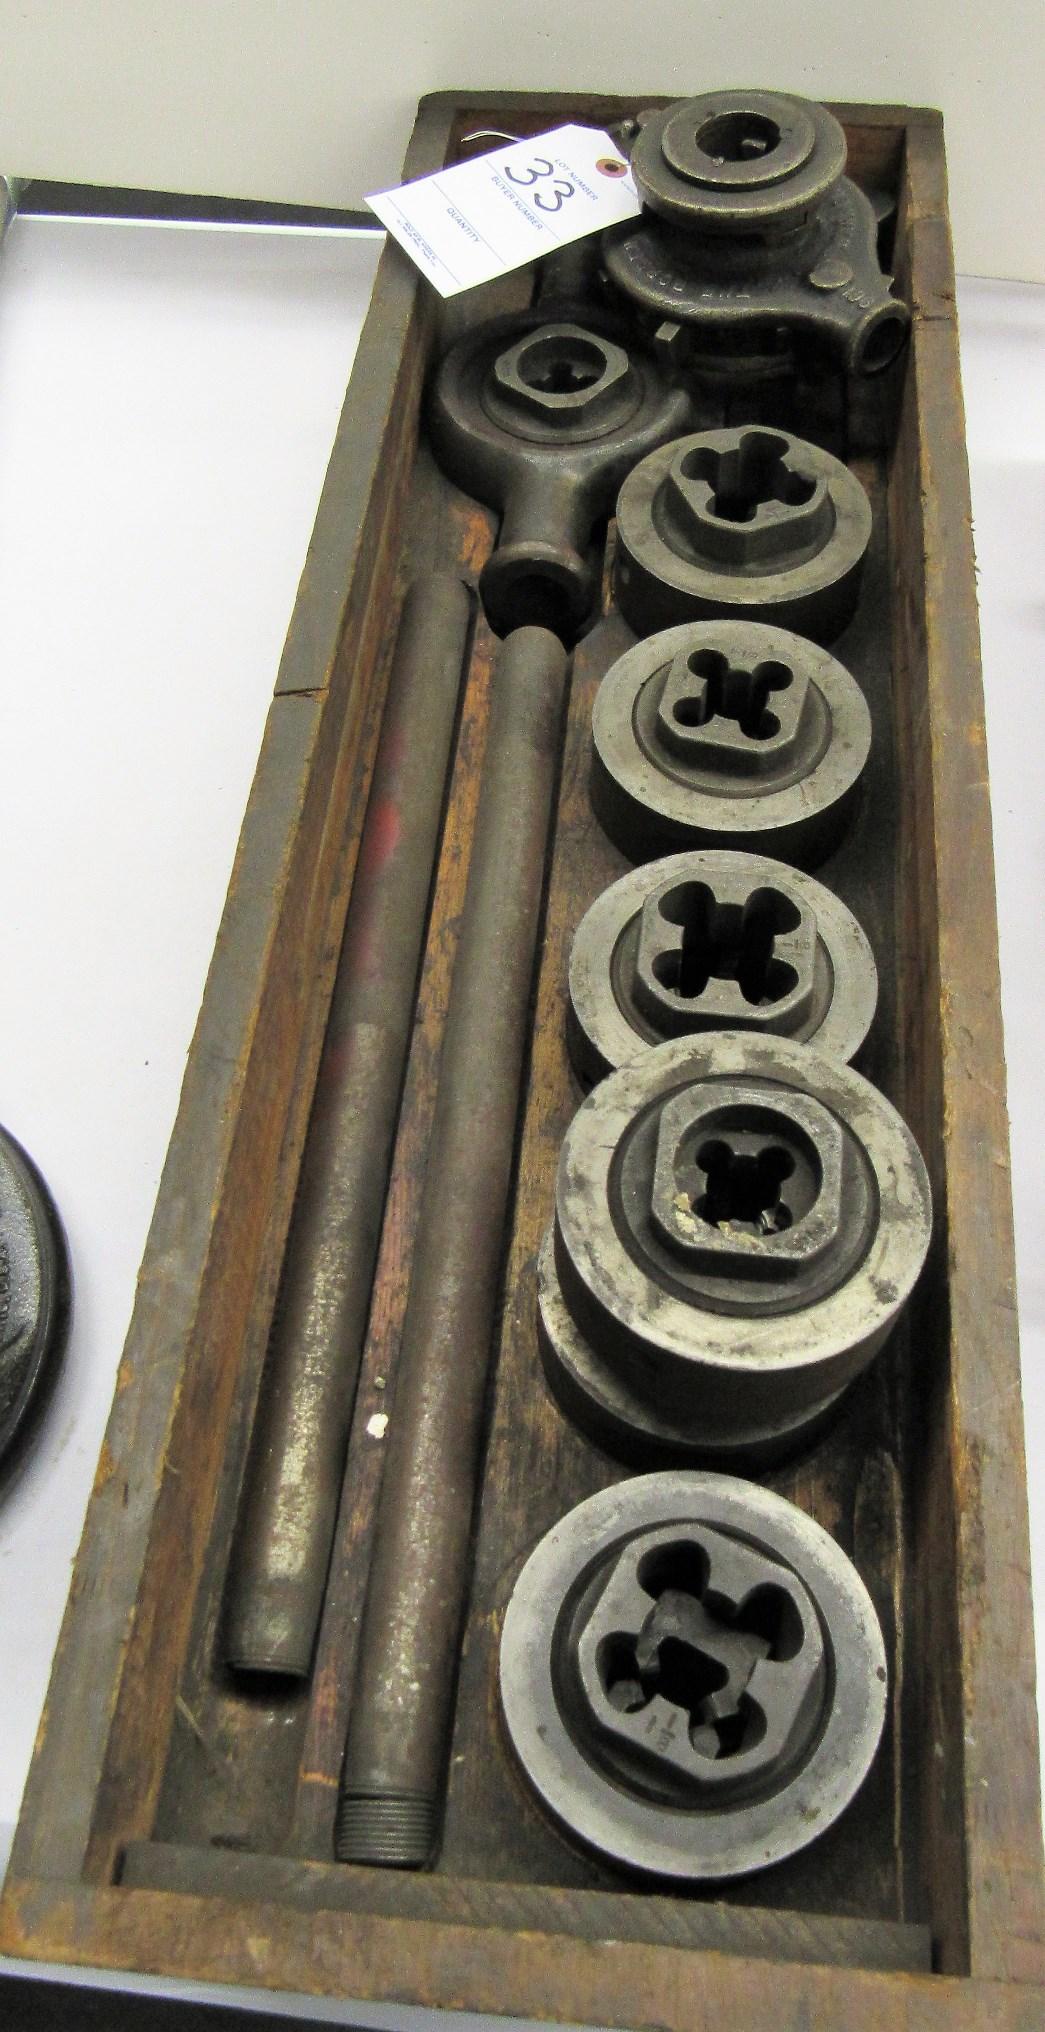 Lot 33 - Pipe Threading Set